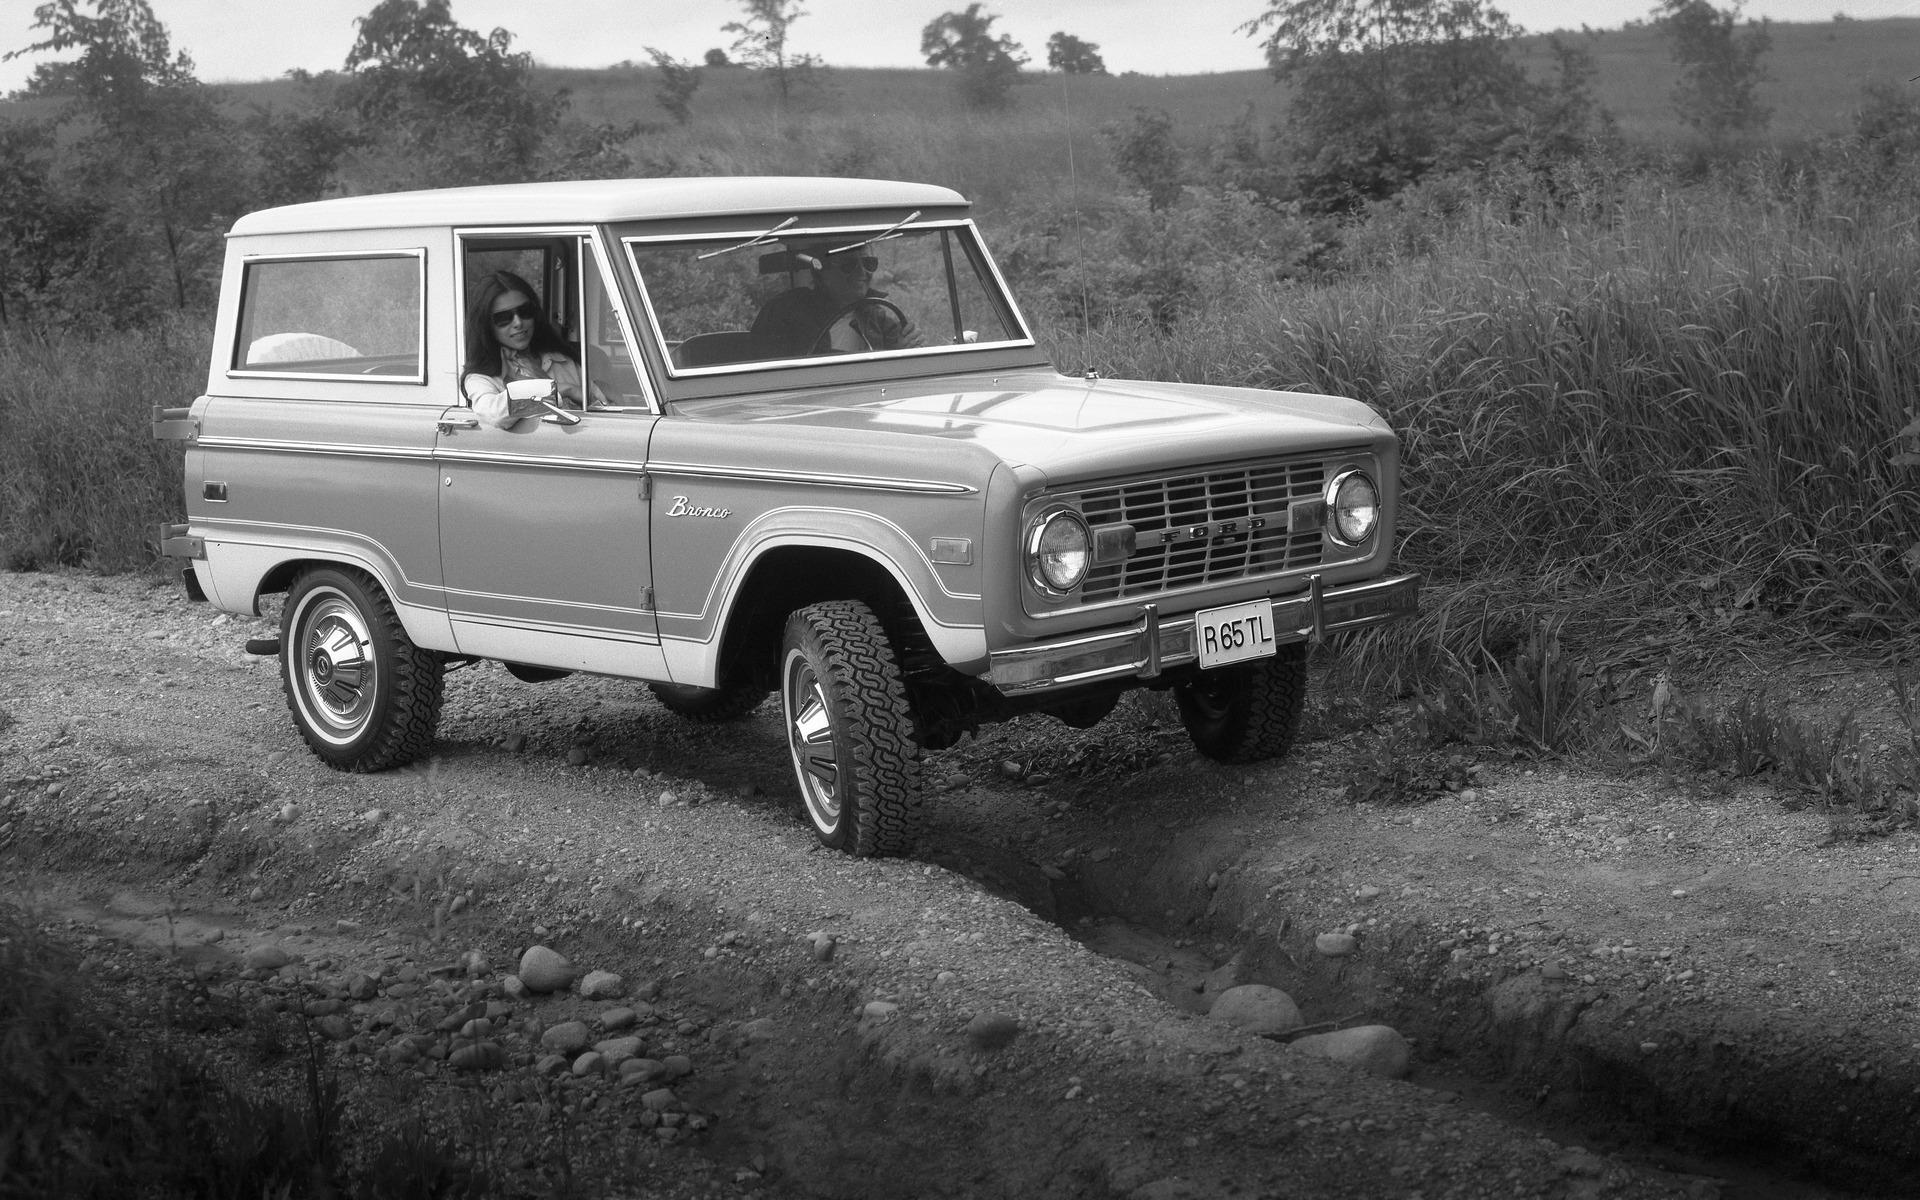 <p>Ford Bronco 1975</p>